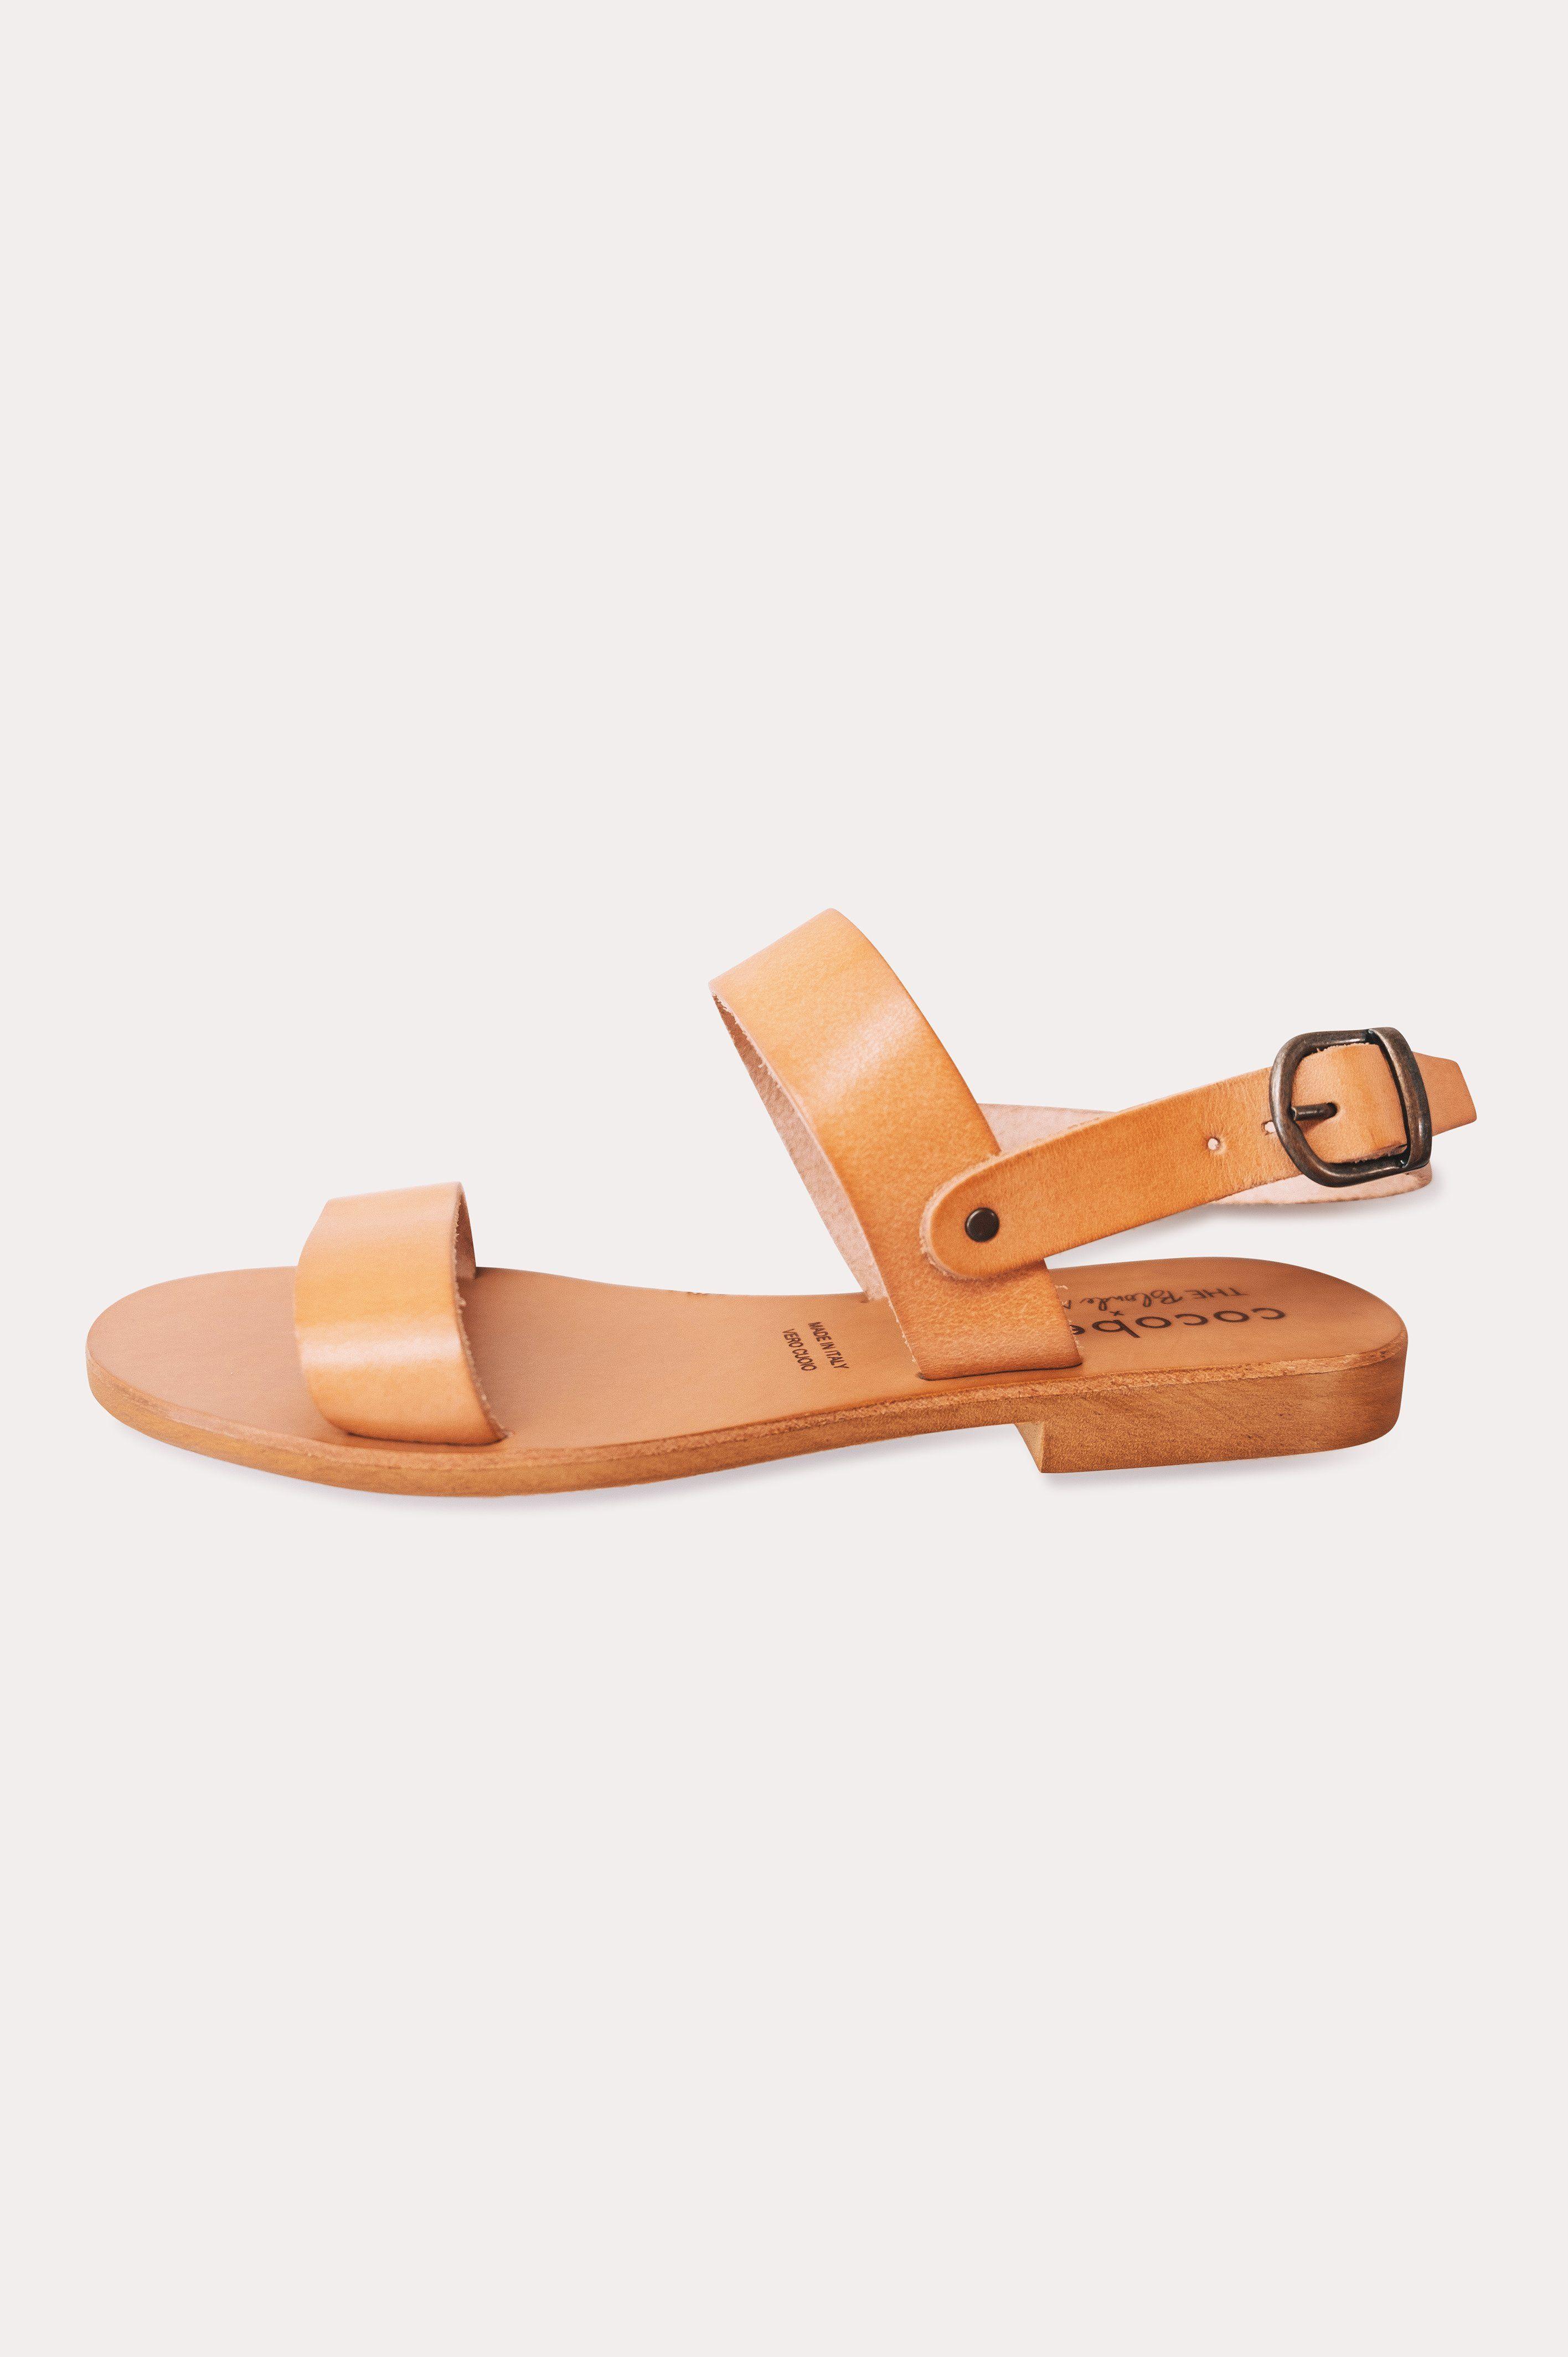 249a1404e636f1 PRE-ORDER The Kiki Sandal by Cocobelle x The Blonde Abroad